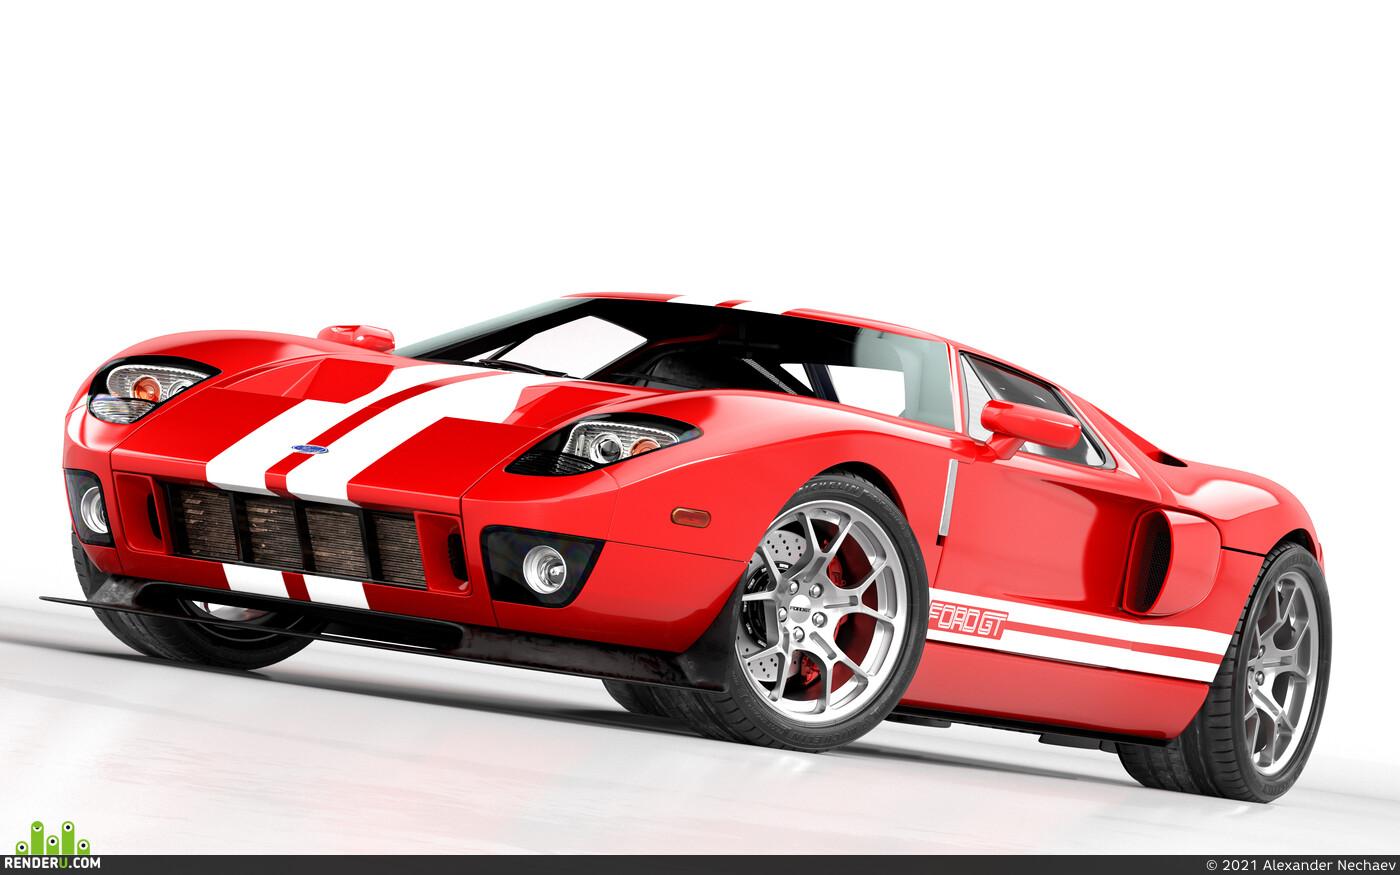 car, automotive, 3Dsmax, vrayrender